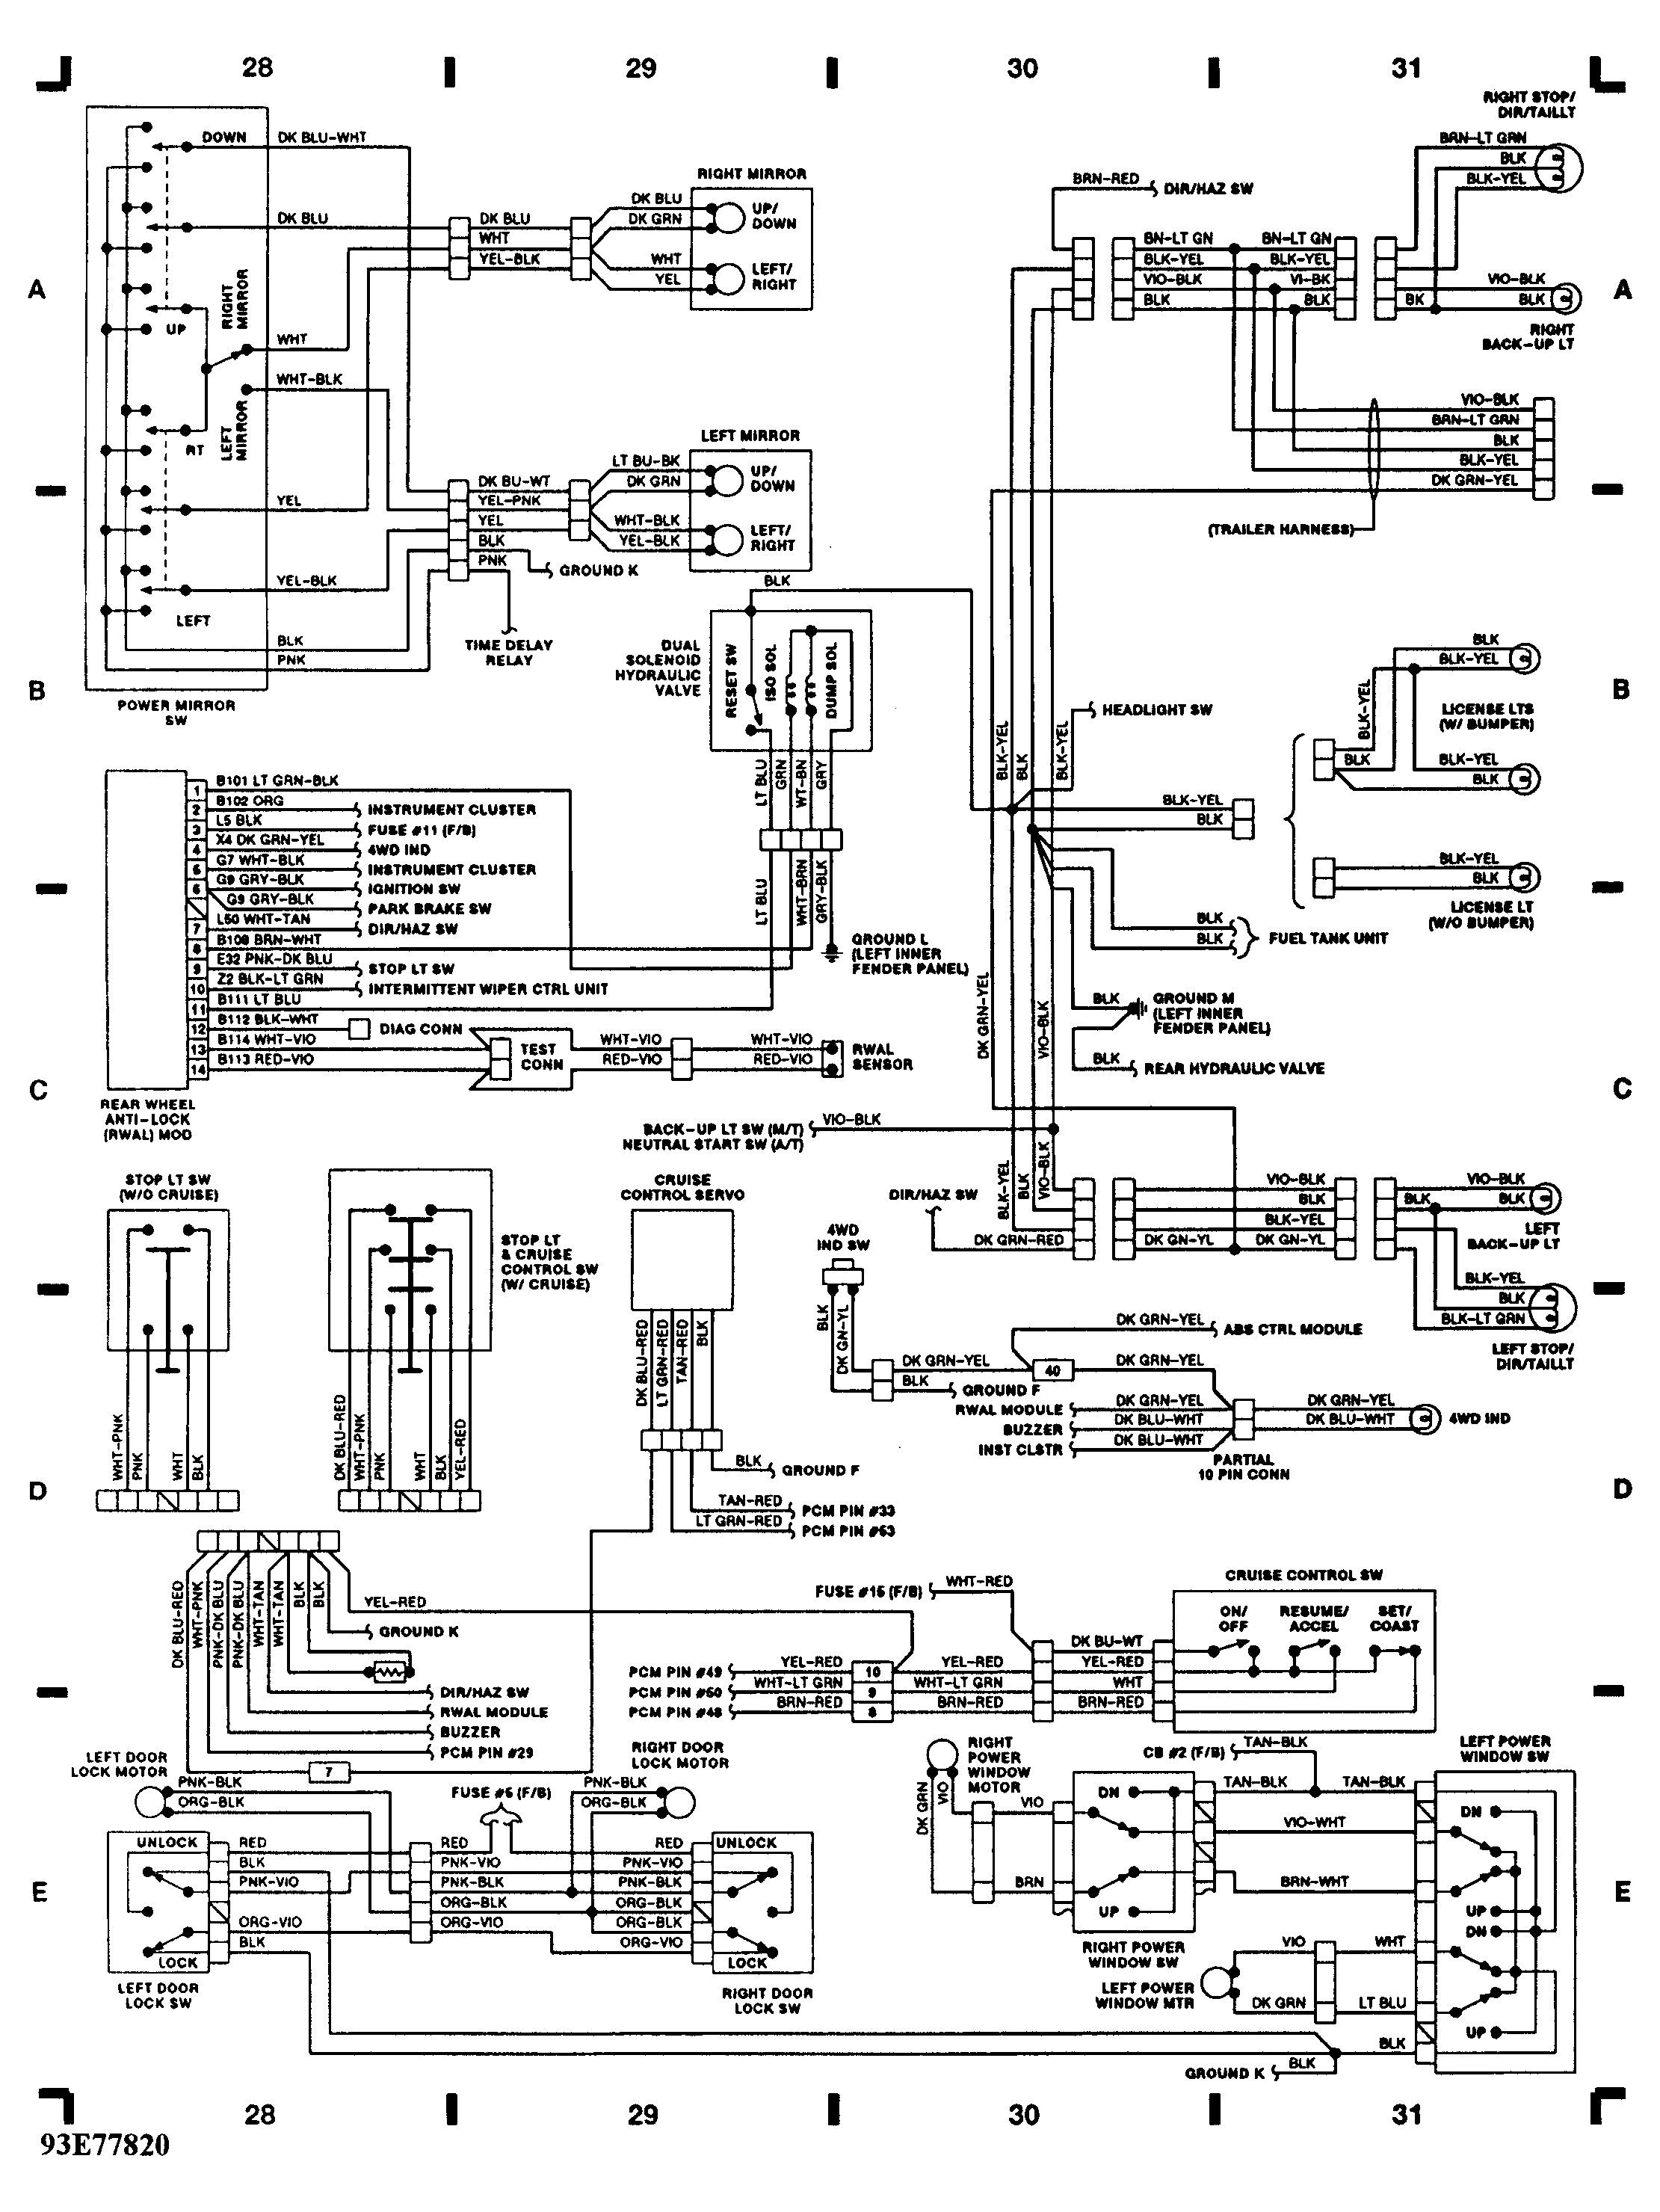 DT_2562] Dodge Ram Dash Light Wiring Diagram Free DiagramIosco Jebrp Hisre Xeira Hyedi Mohammedshrine Librar Wiring 101